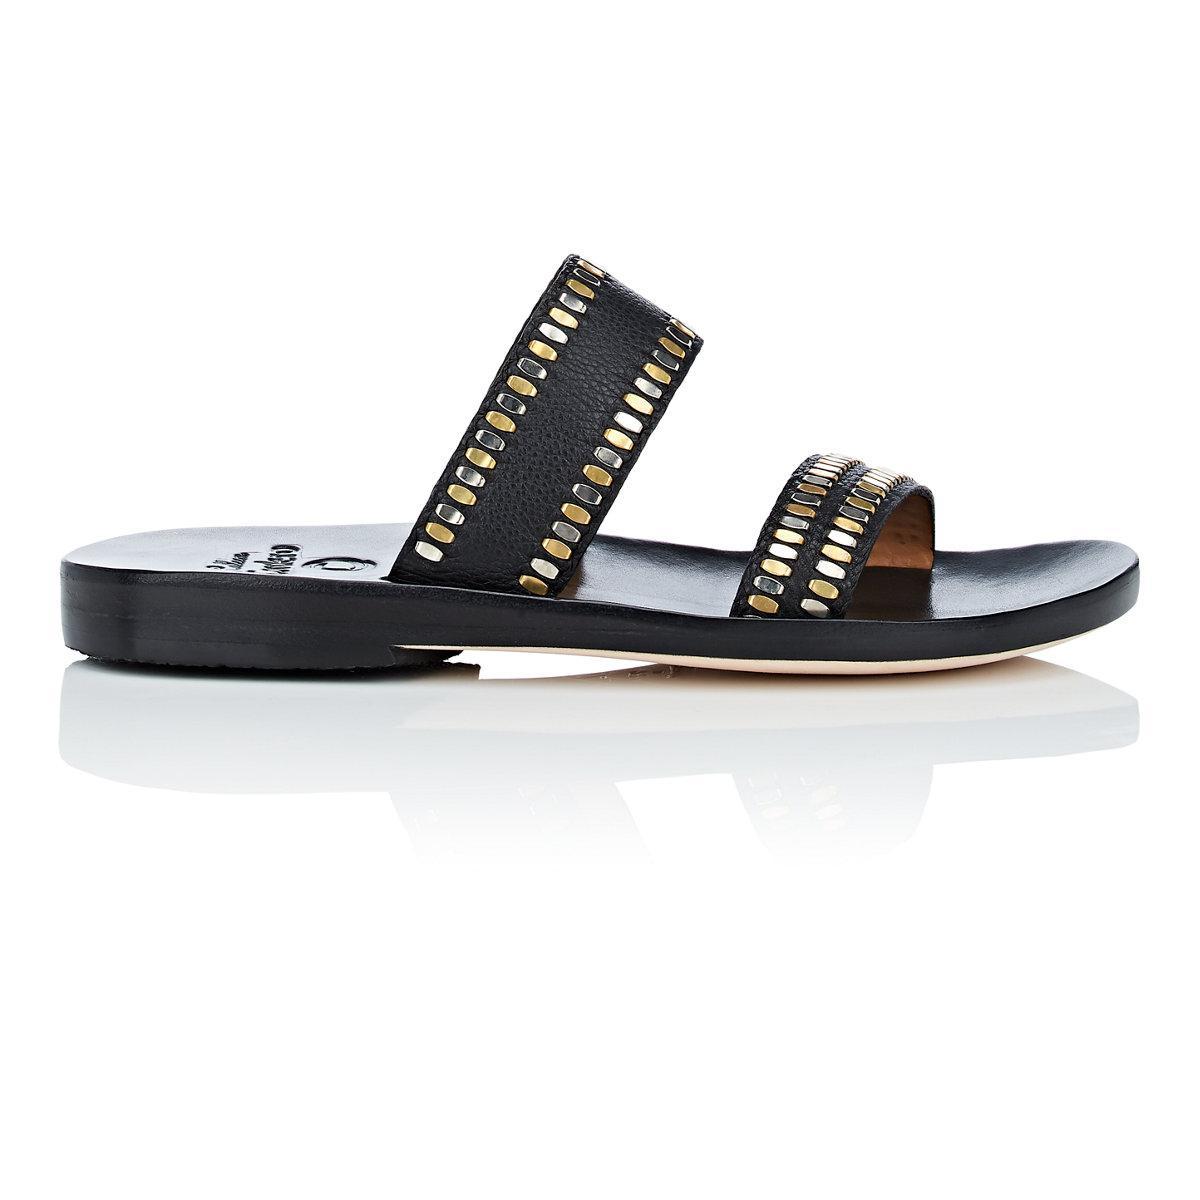 Womens Adella Leather Sandals Calleen Cordero t5M9XmU